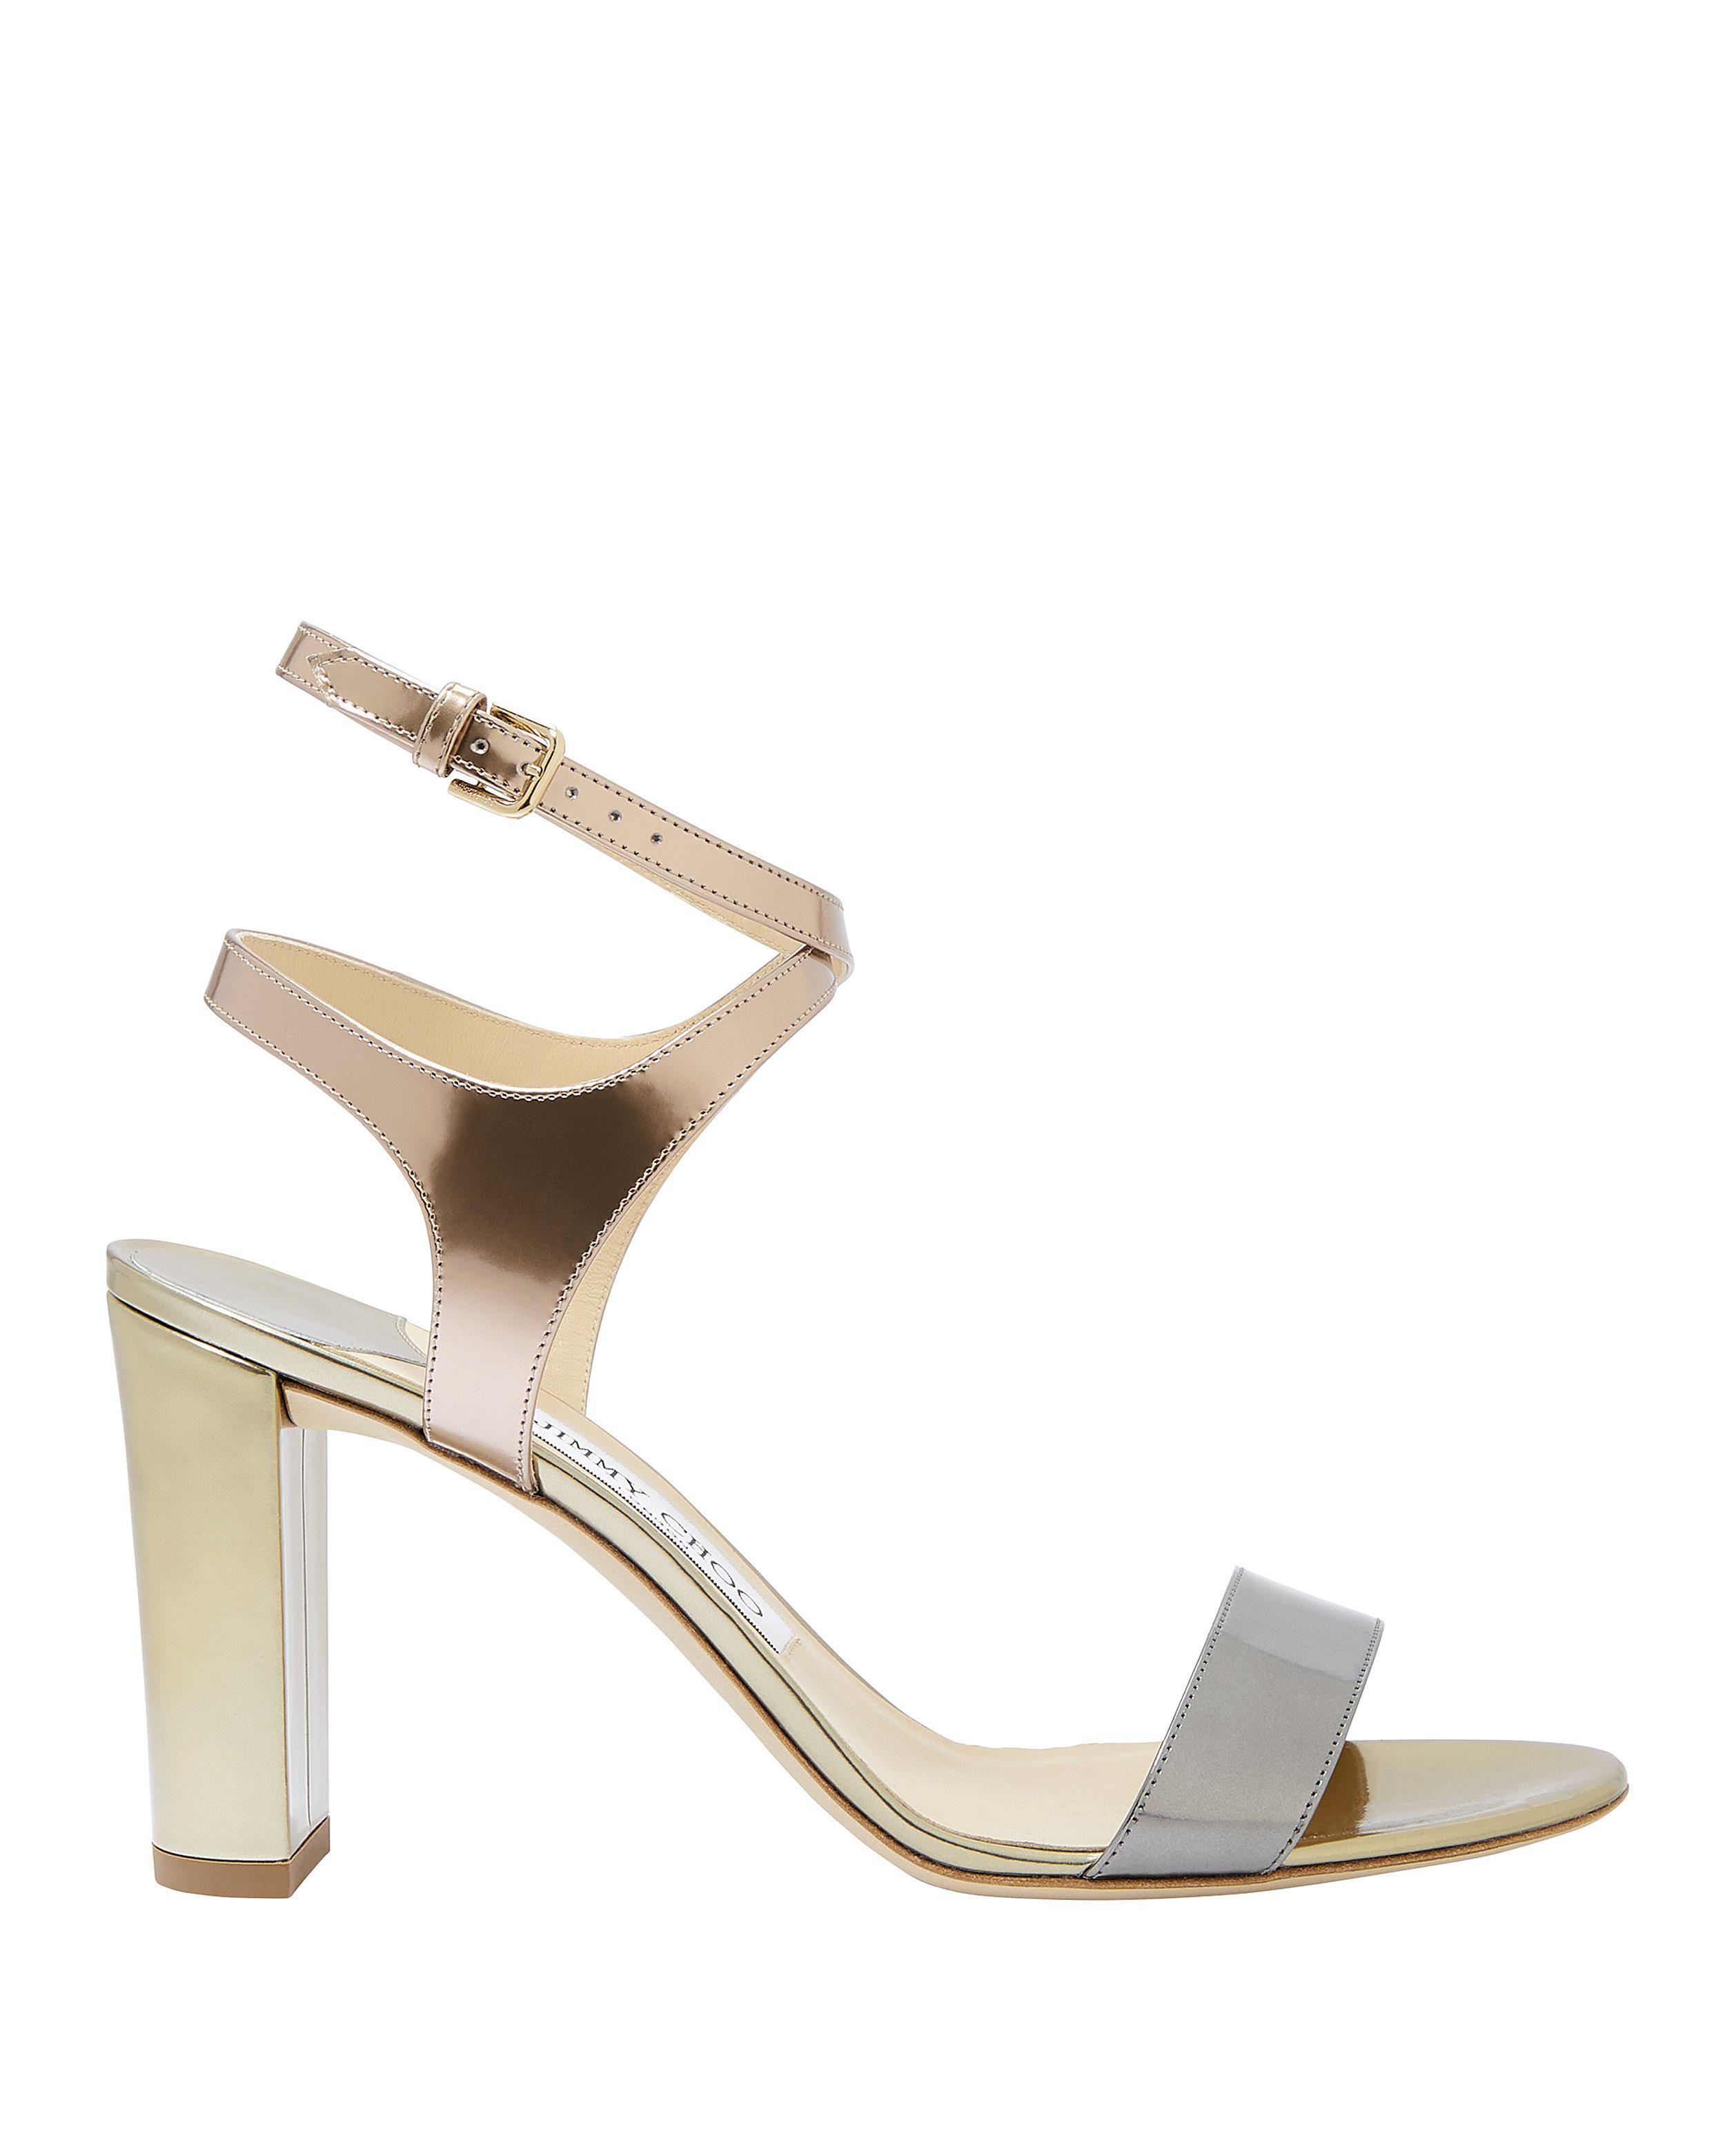 0736e78f1ed Lyst - Jimmy Choo Marine Metallic High Sandals in Metallic